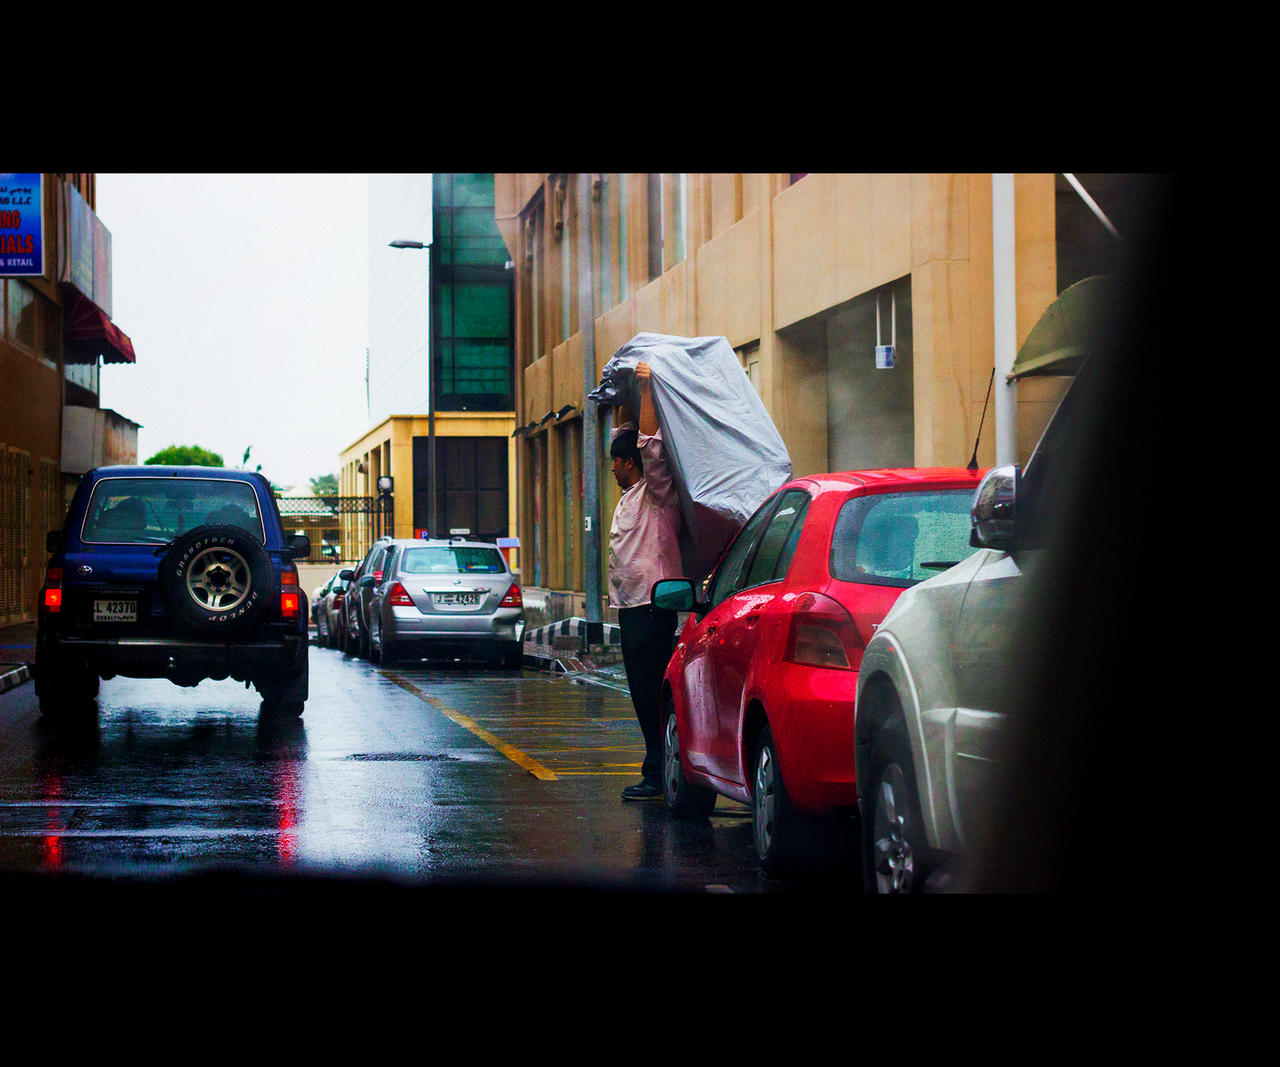 Strongman's Umbrella by MARX77